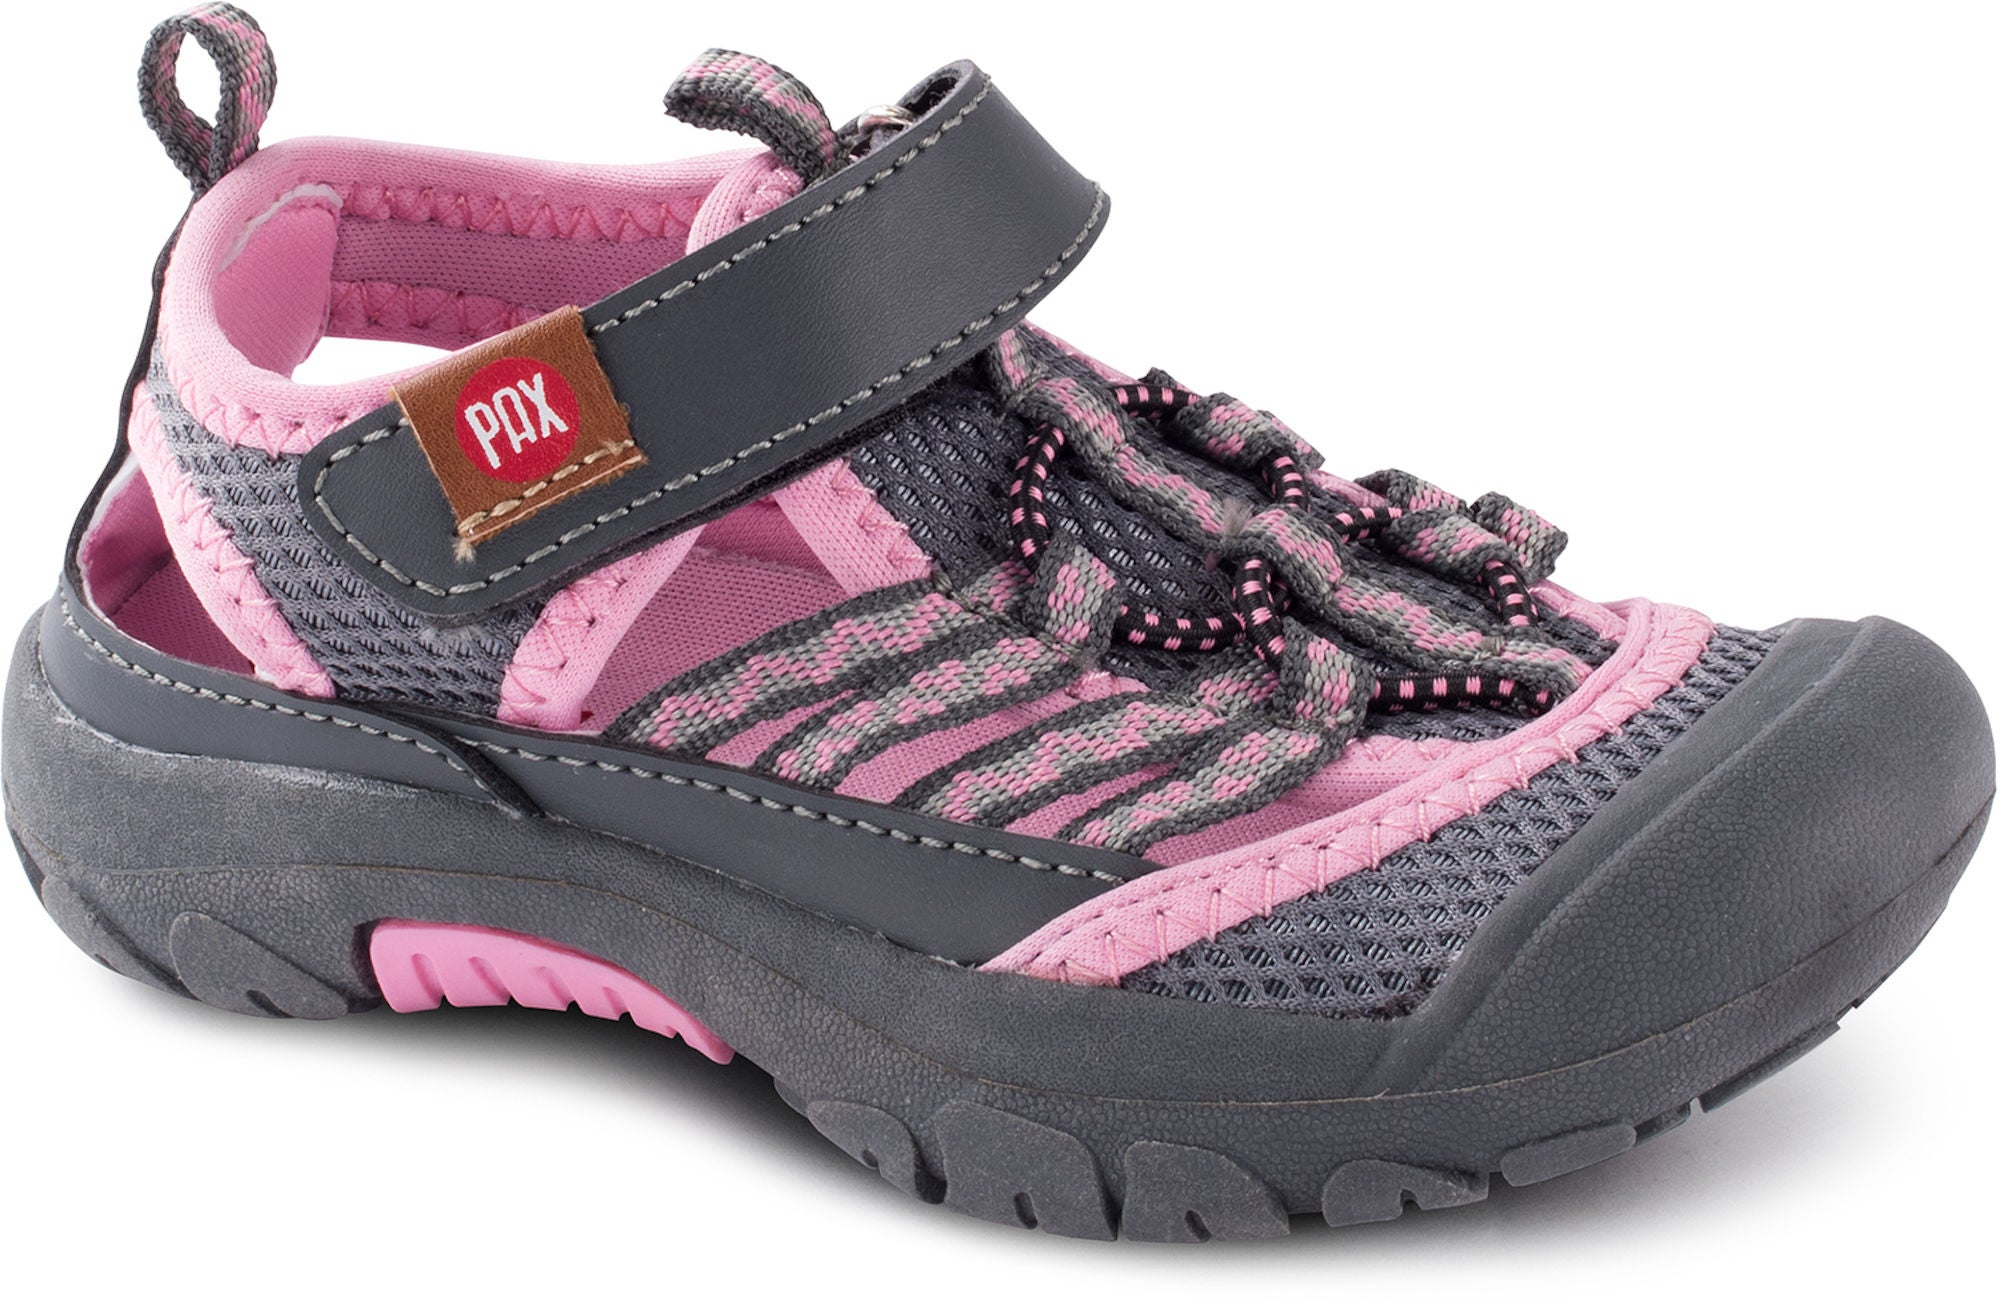 Pax Holk Sandal, Rosa 30